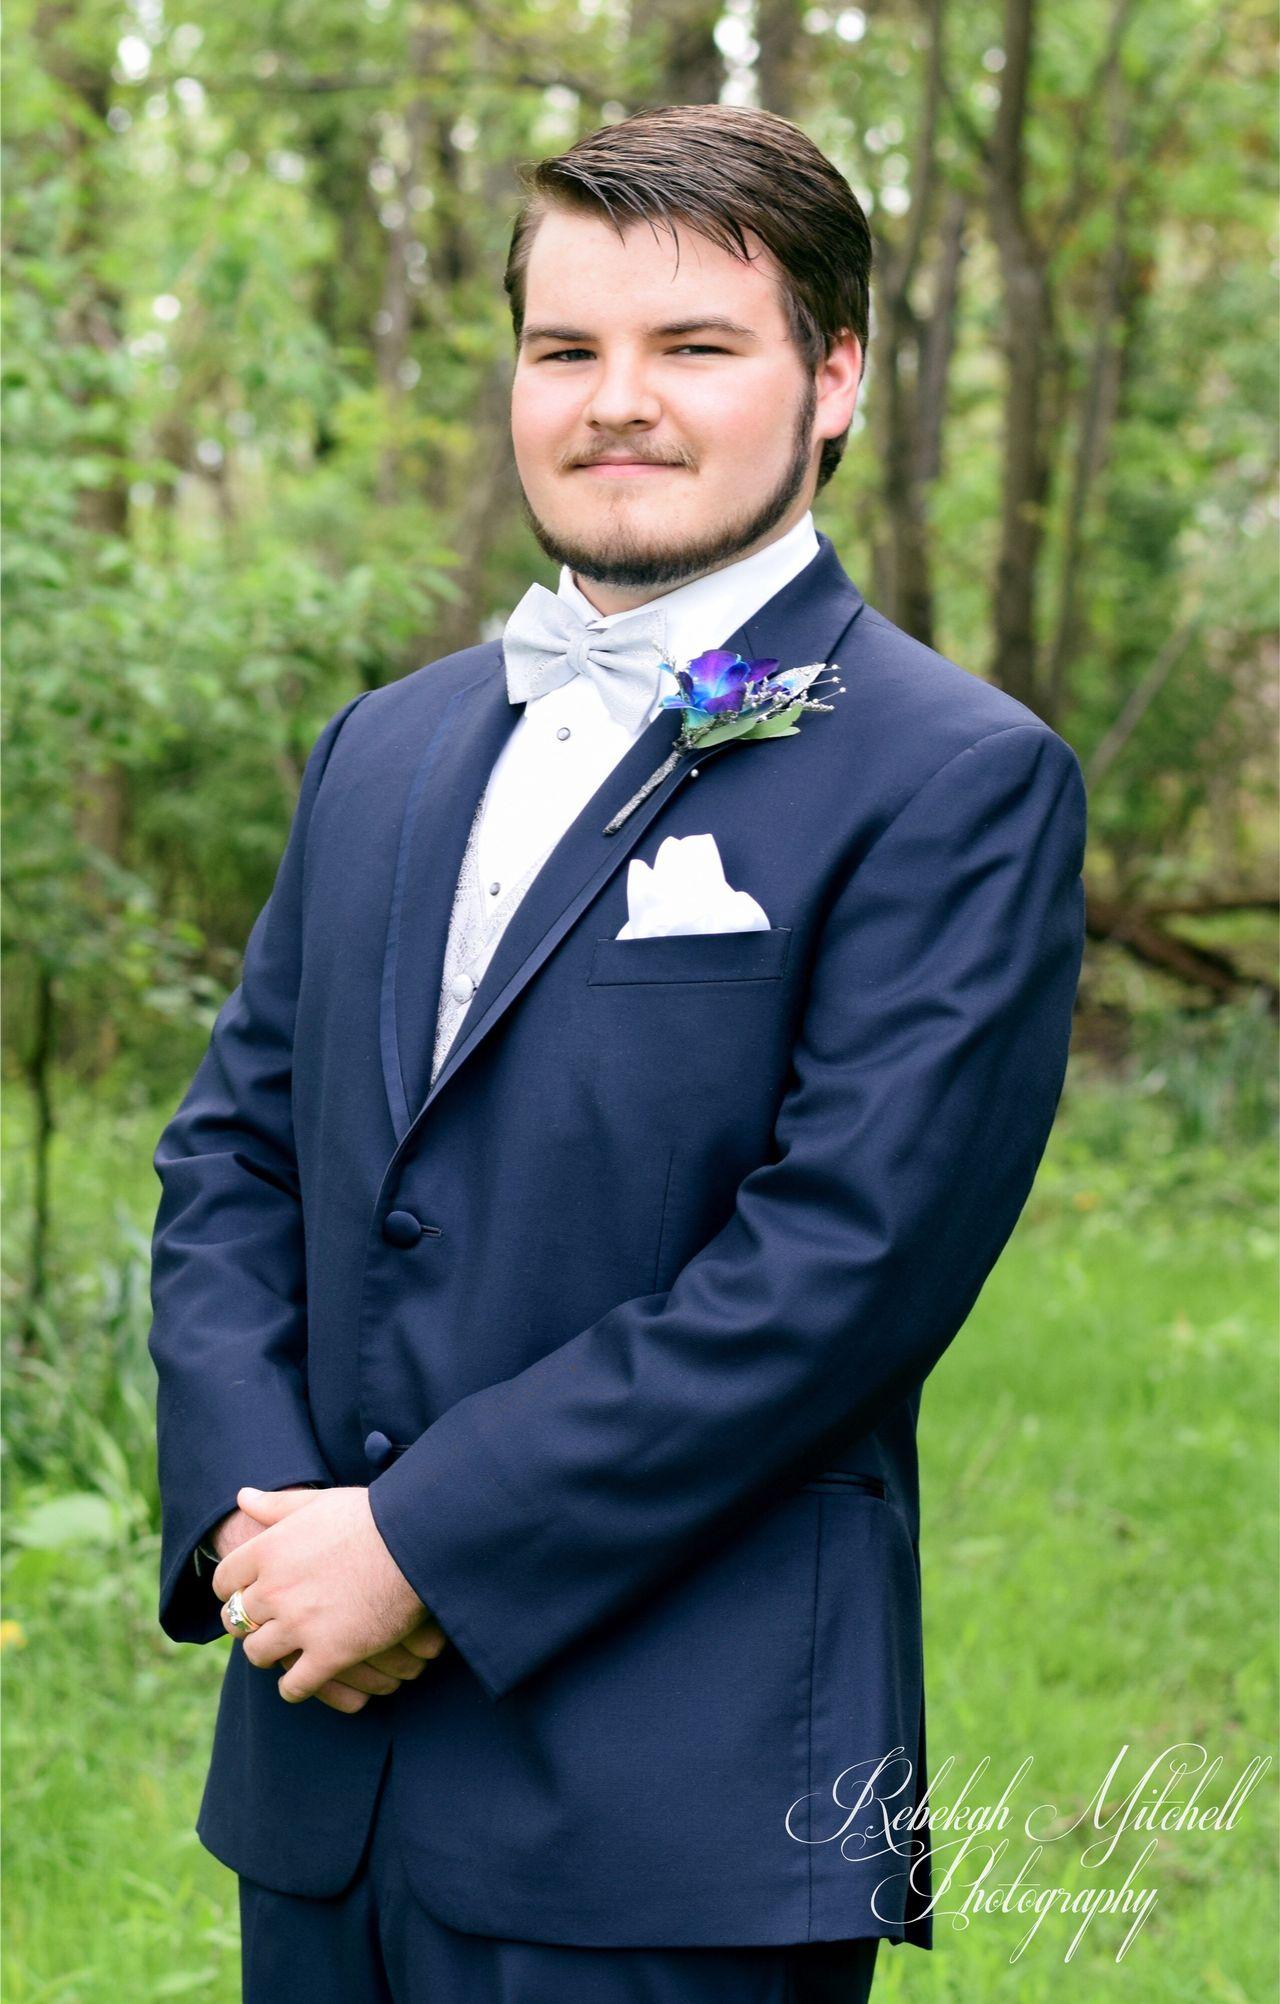 Bachlor Handsome Prom Wedding Outdoors Boy